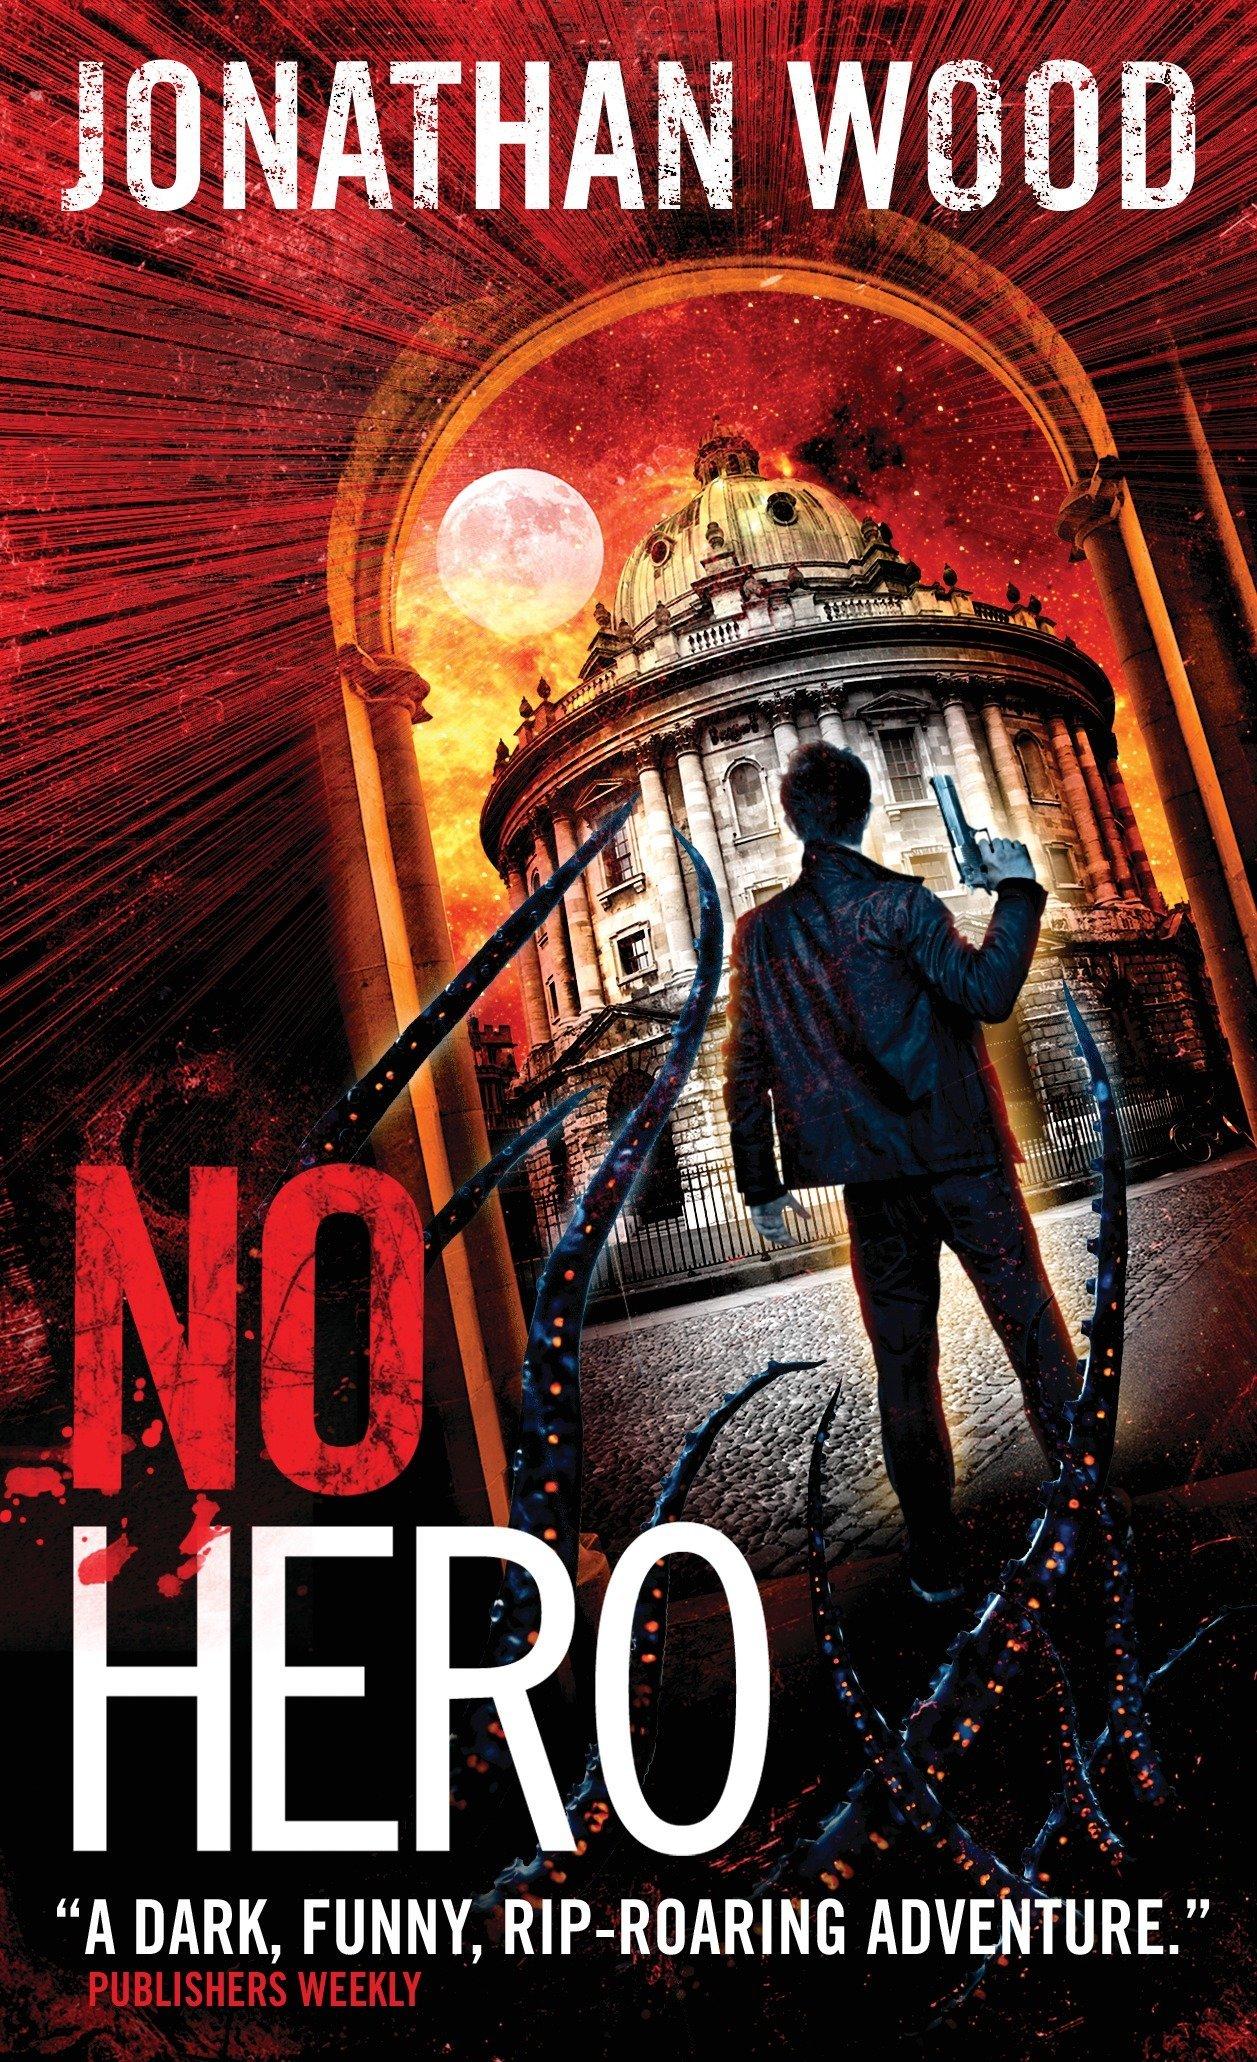 Amazon.com: No Hero (Arthur Wallace) (9781781168066): Jonathan Wood: Books